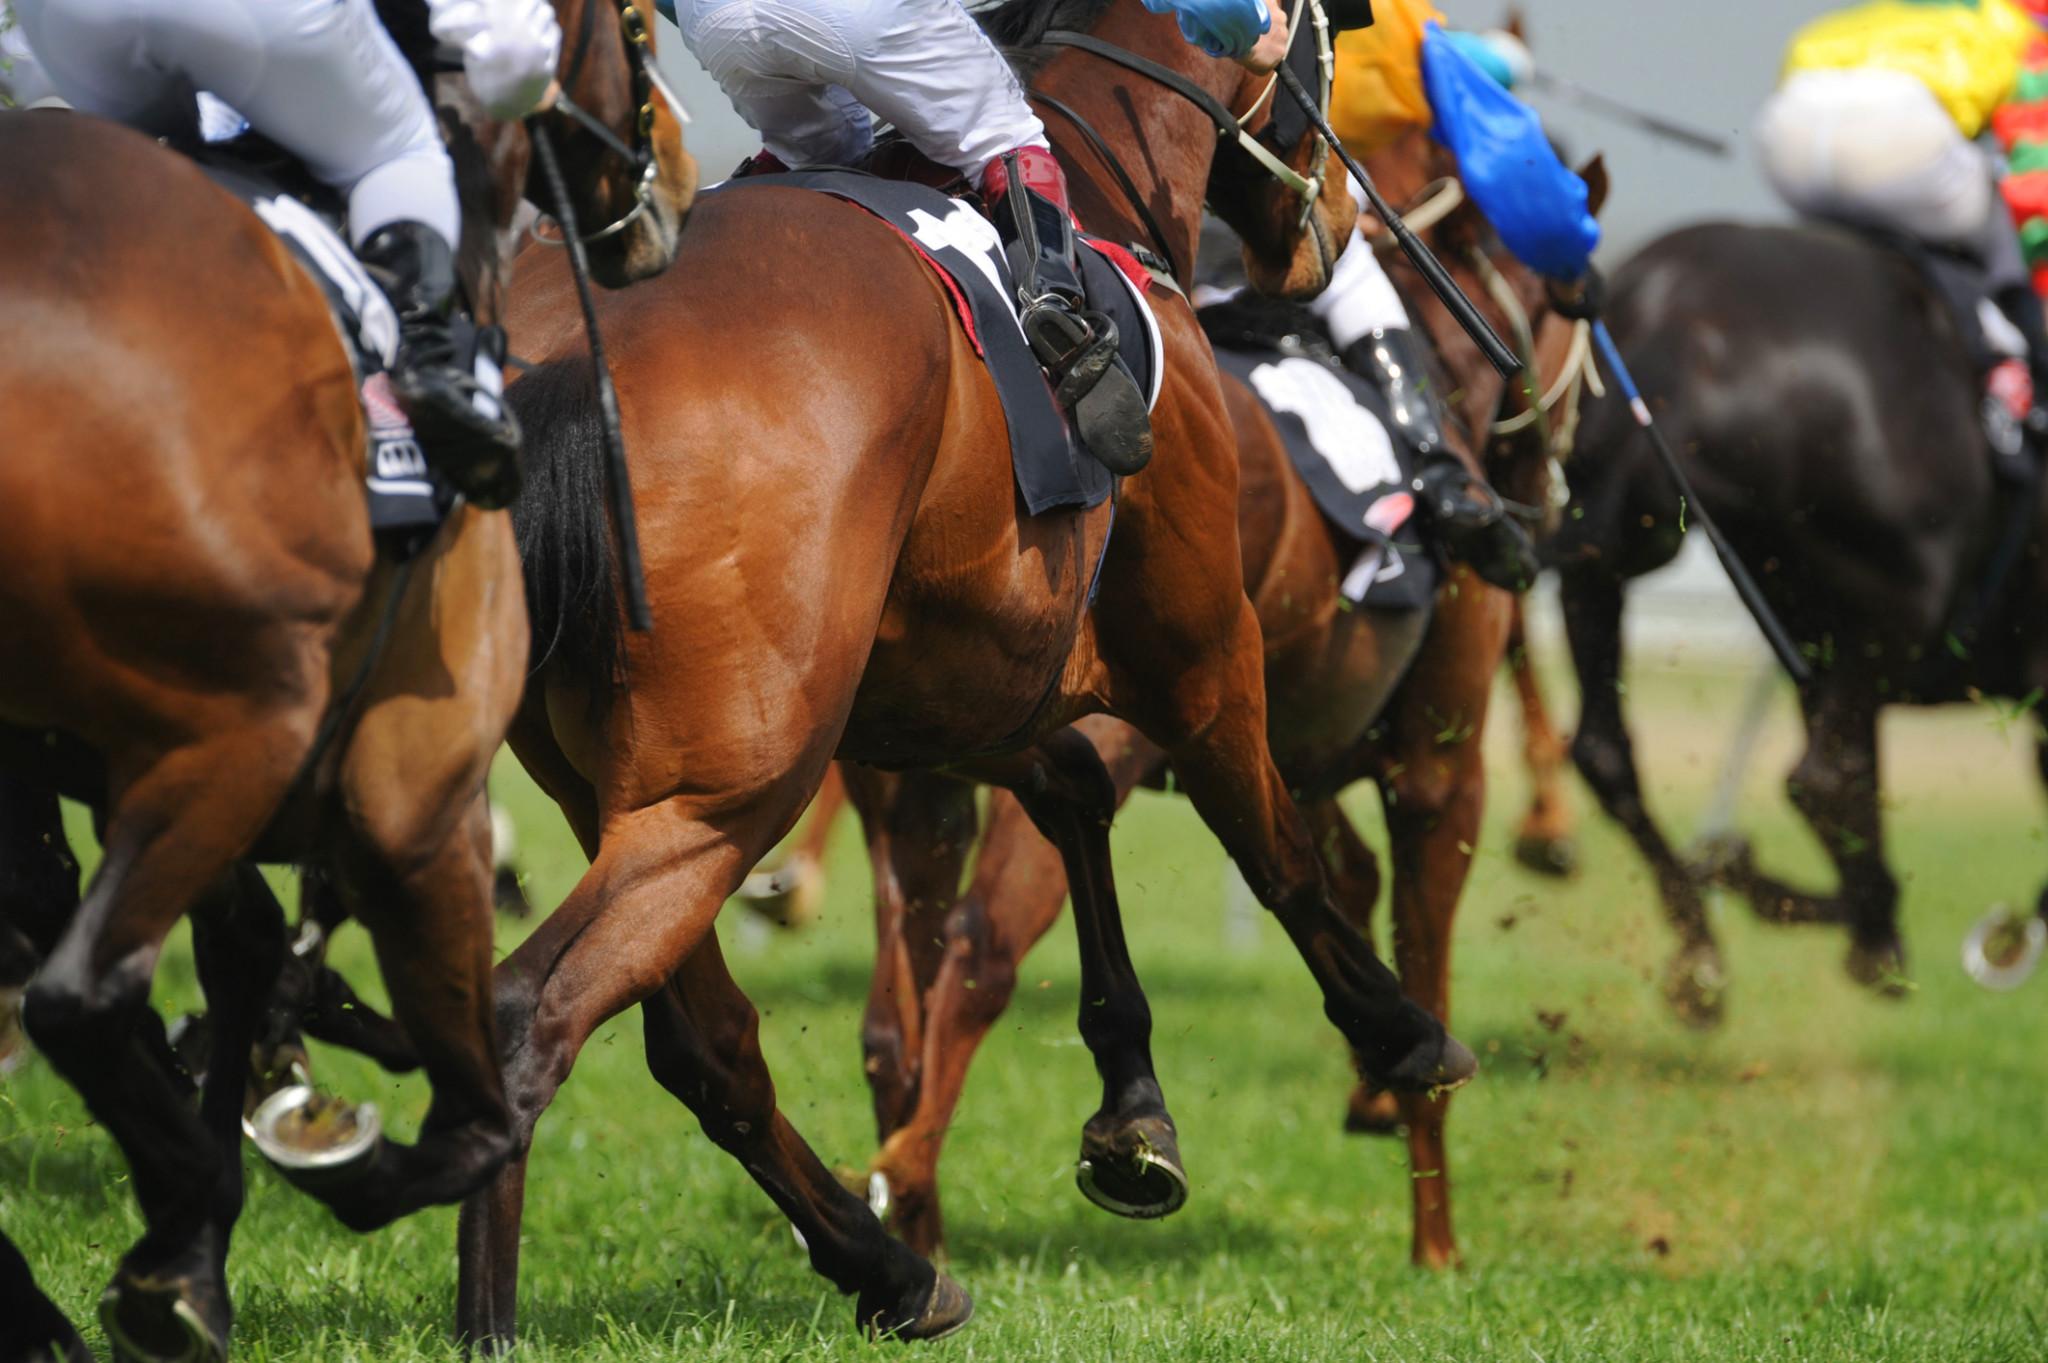 Horseracing image